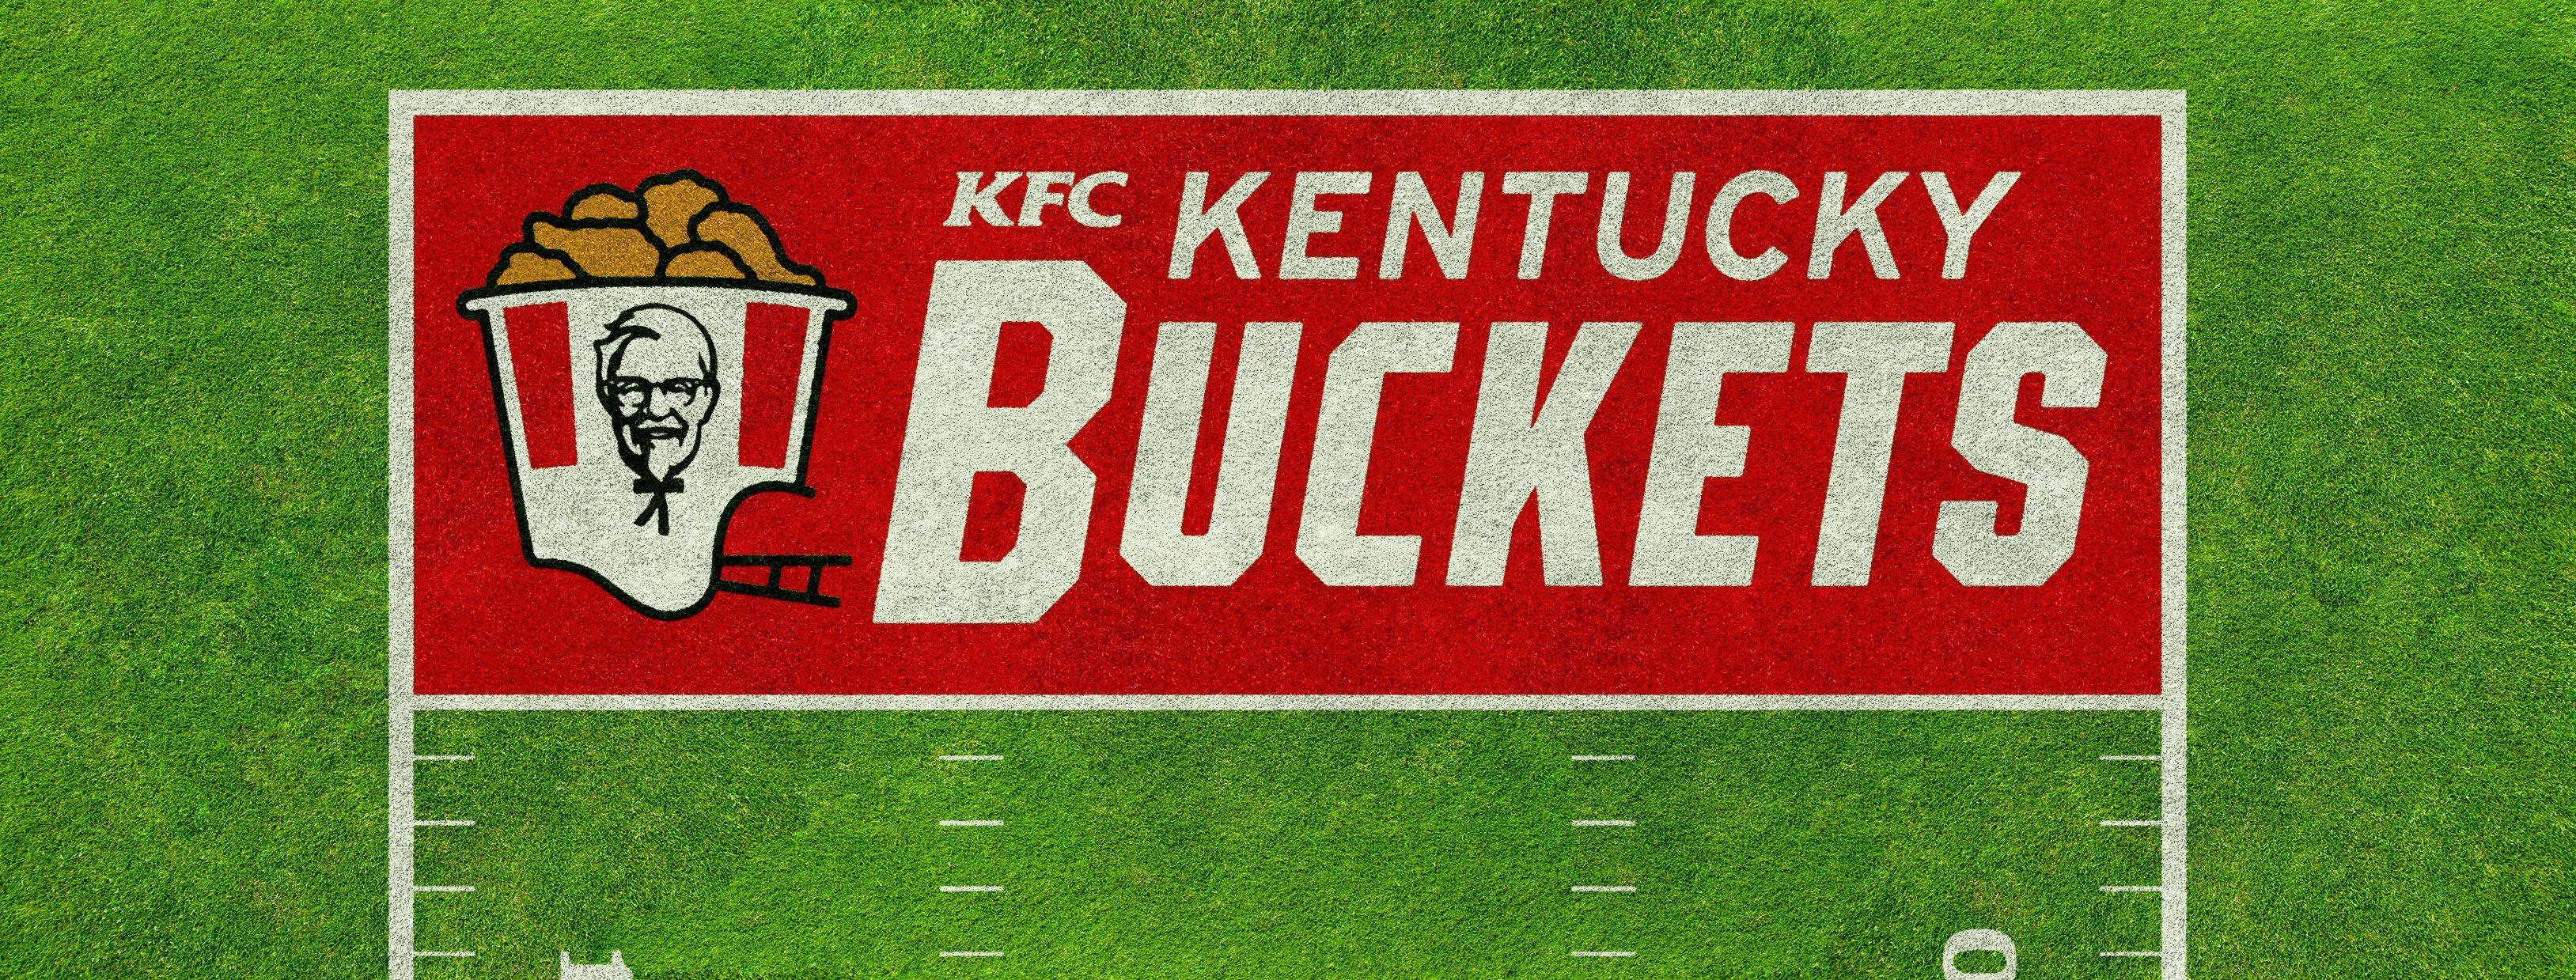 KFC Kentucky Fried Chicken - Lantana to go